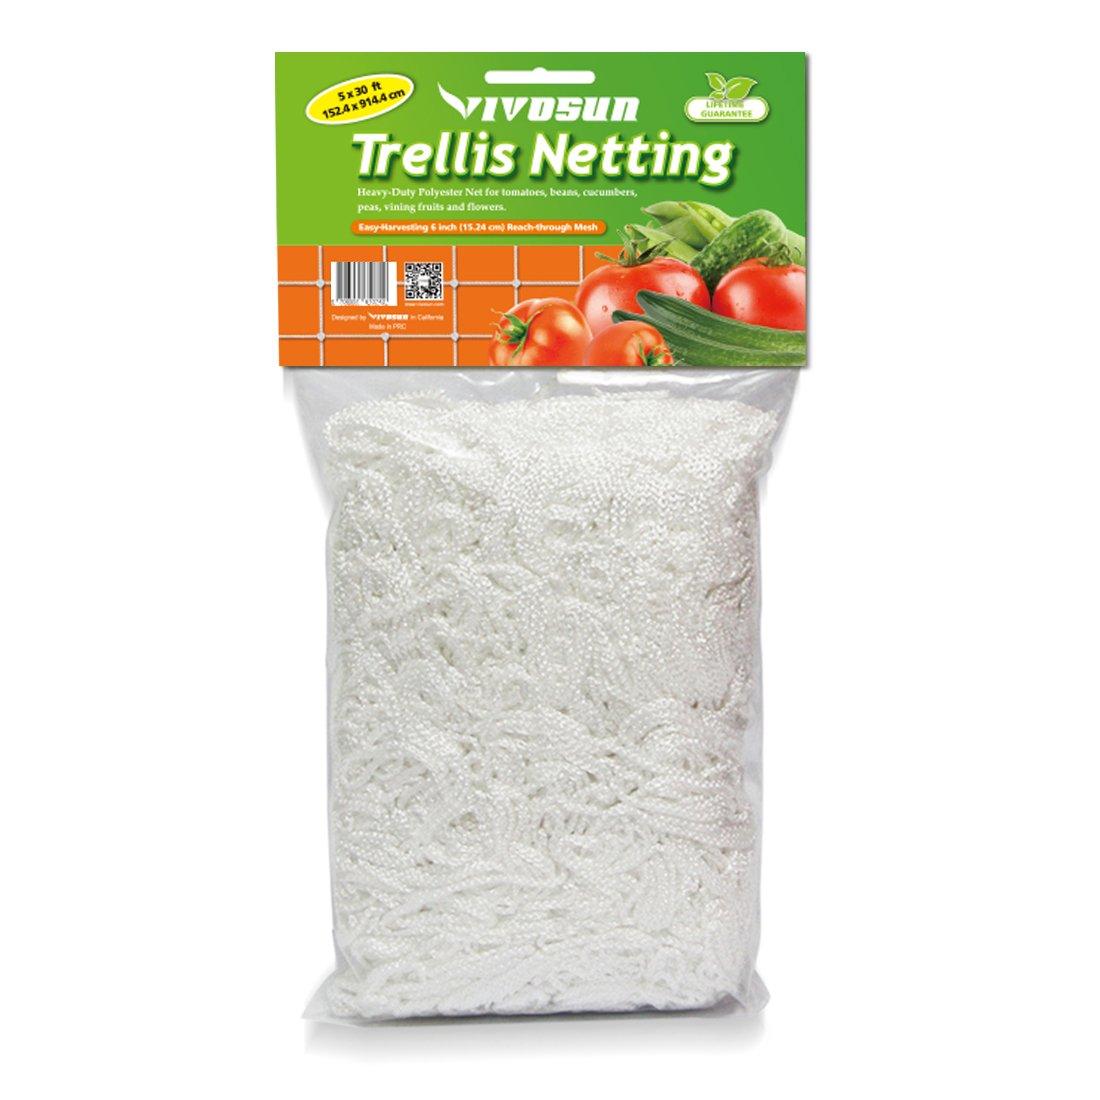 VIVOSUN 5 x 30ft Heavy-duty Polyester Plant Trellis Netting 1 Pack by VIVOSUN